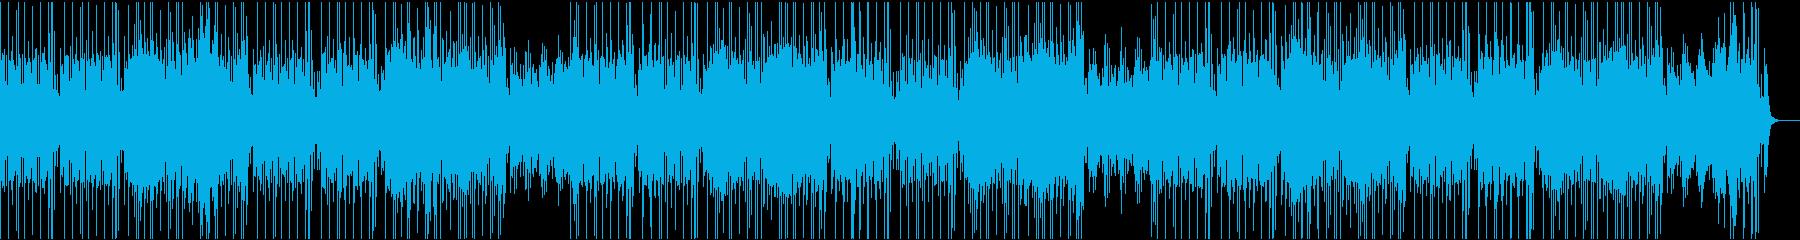 Refreshing violin / karaoke's reproduced waveform